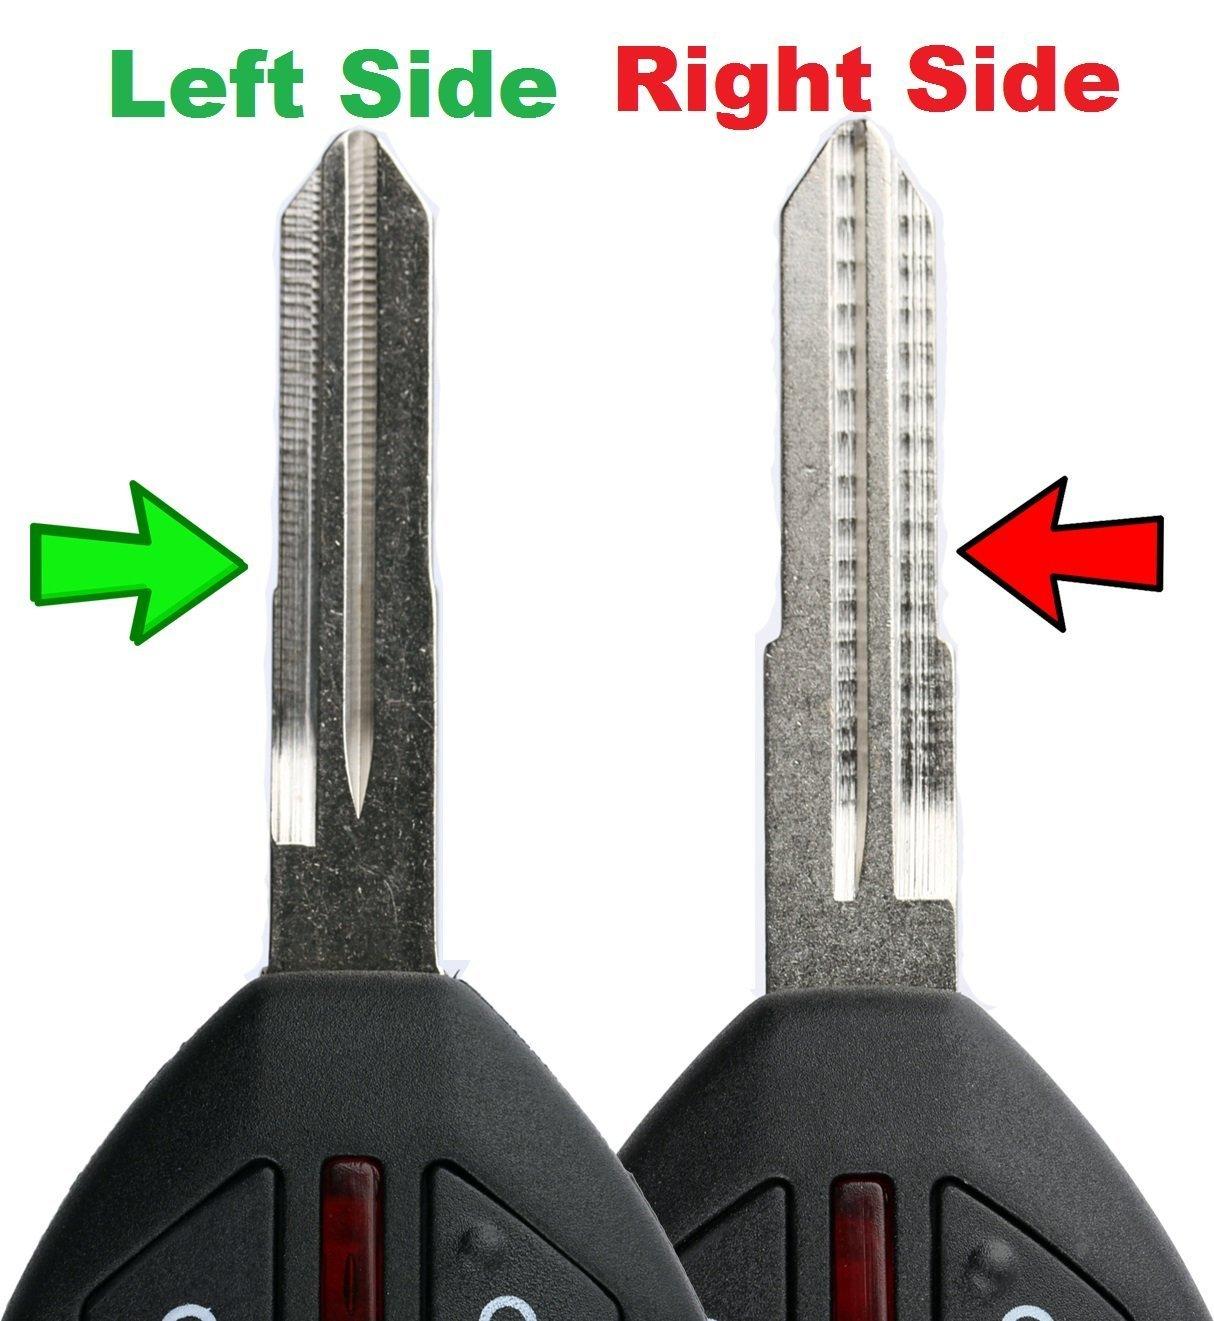 KeylessOption Keyless Entry Remote Key Fob Shell Case Blade Uncut For Endeavor